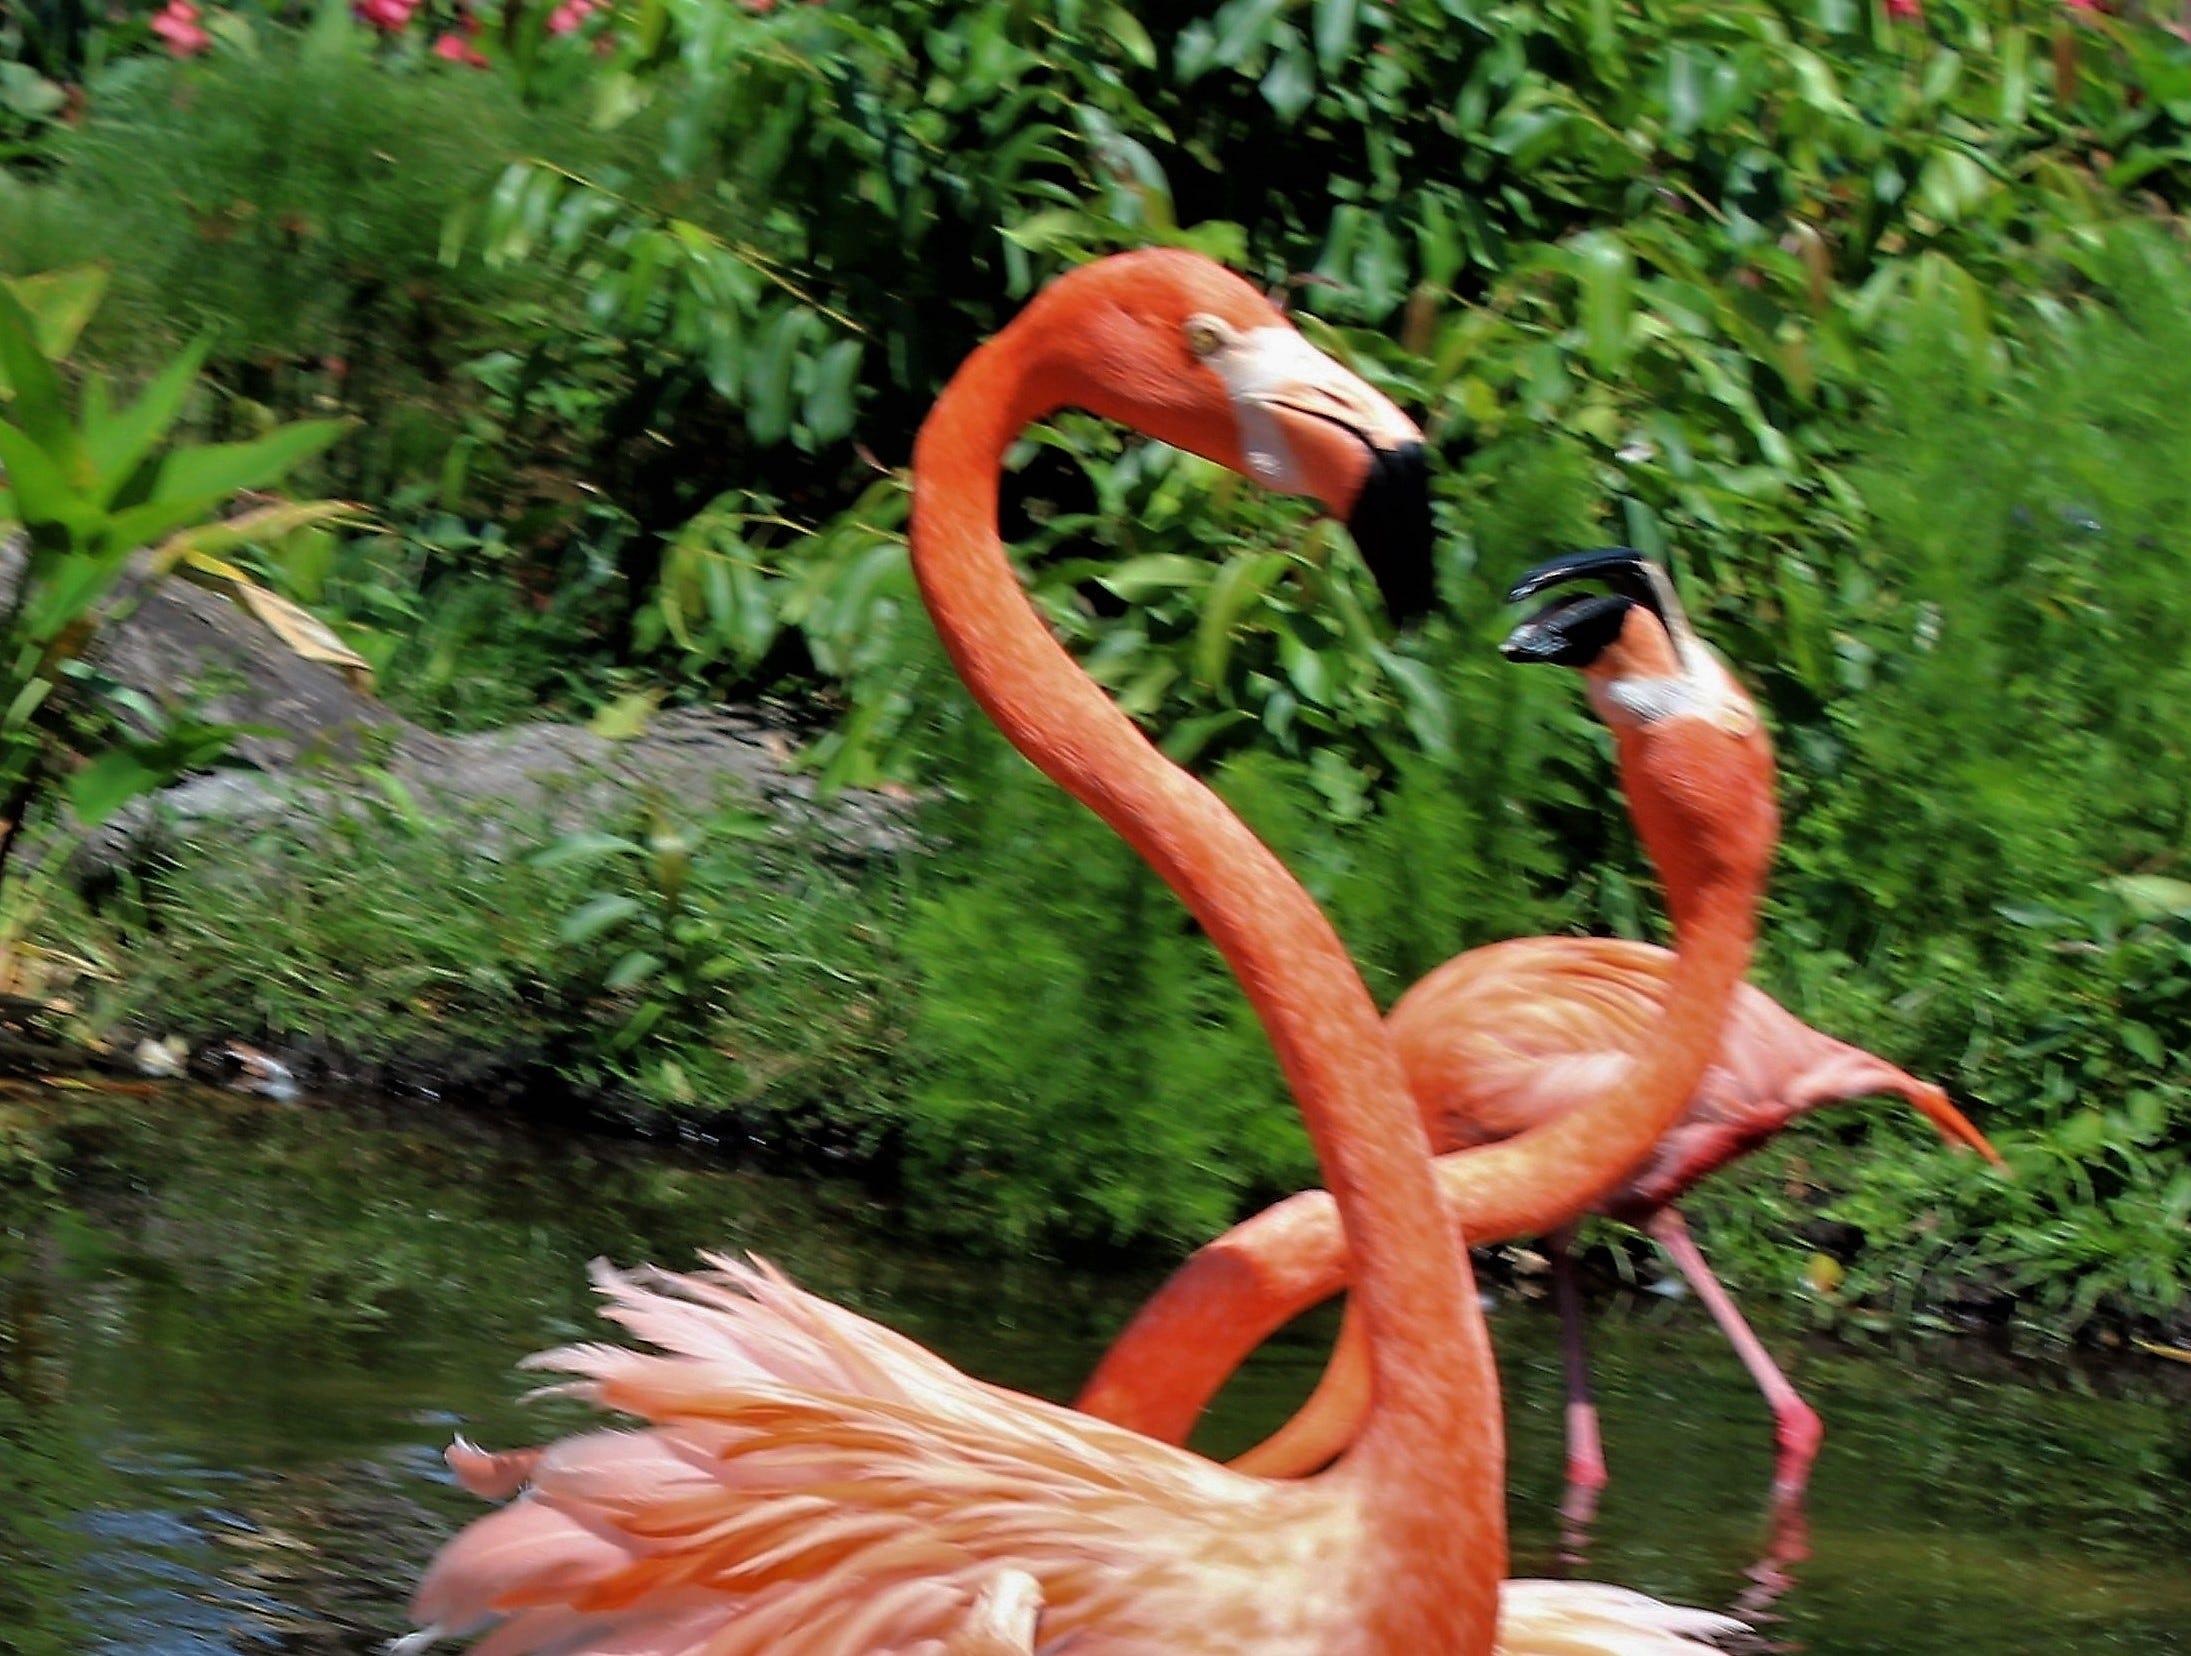 Margaret Mansfield took this photo of flamingos.